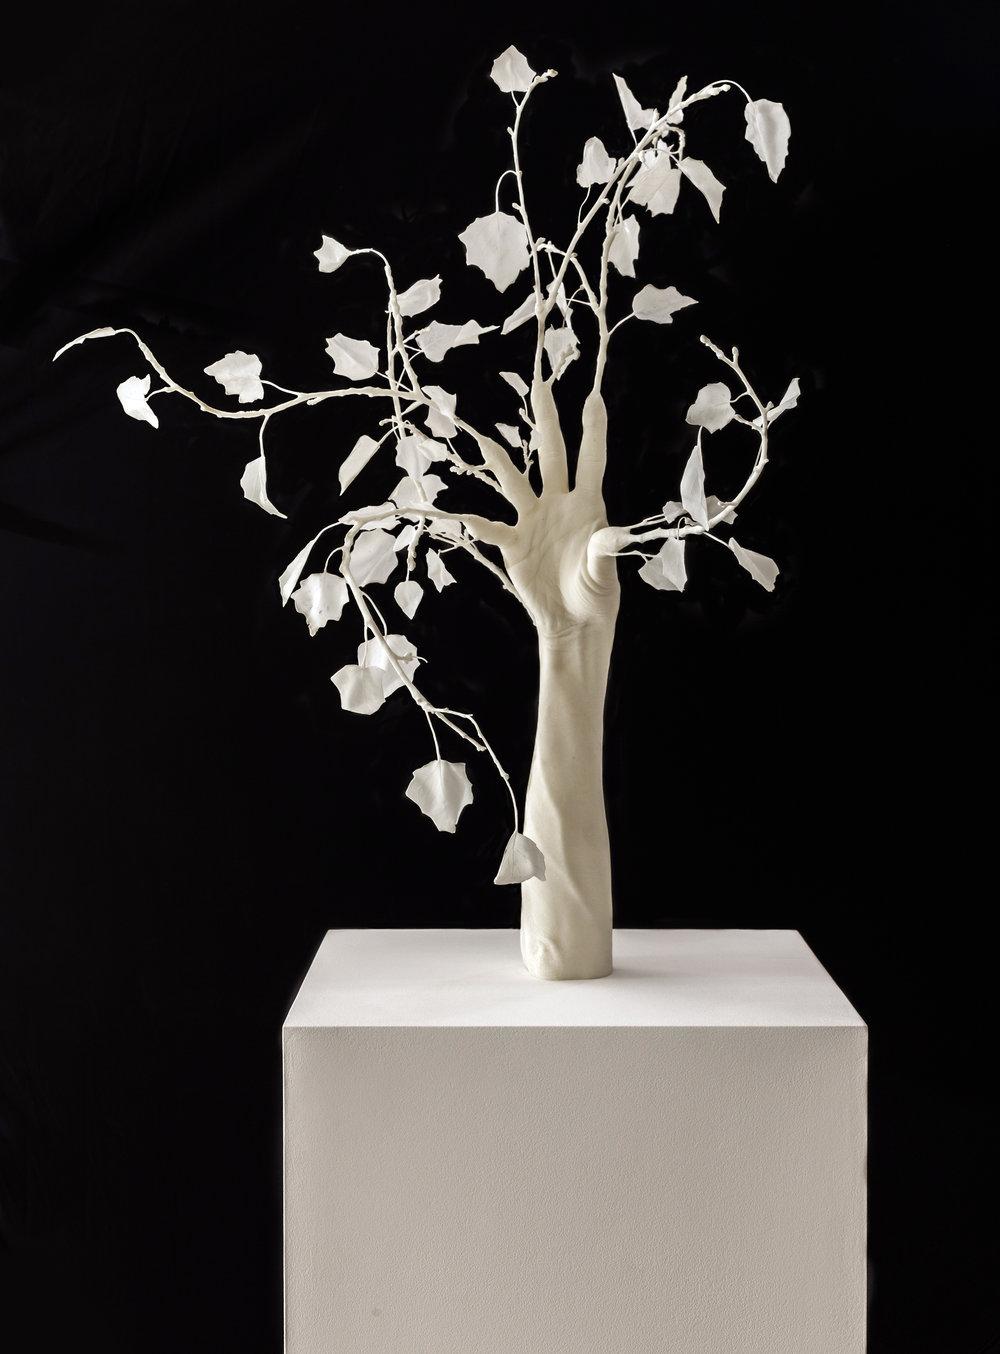 Daphné, 2014 resin 70 x 80 cm - 27 1/2 x 31 1/2 inches